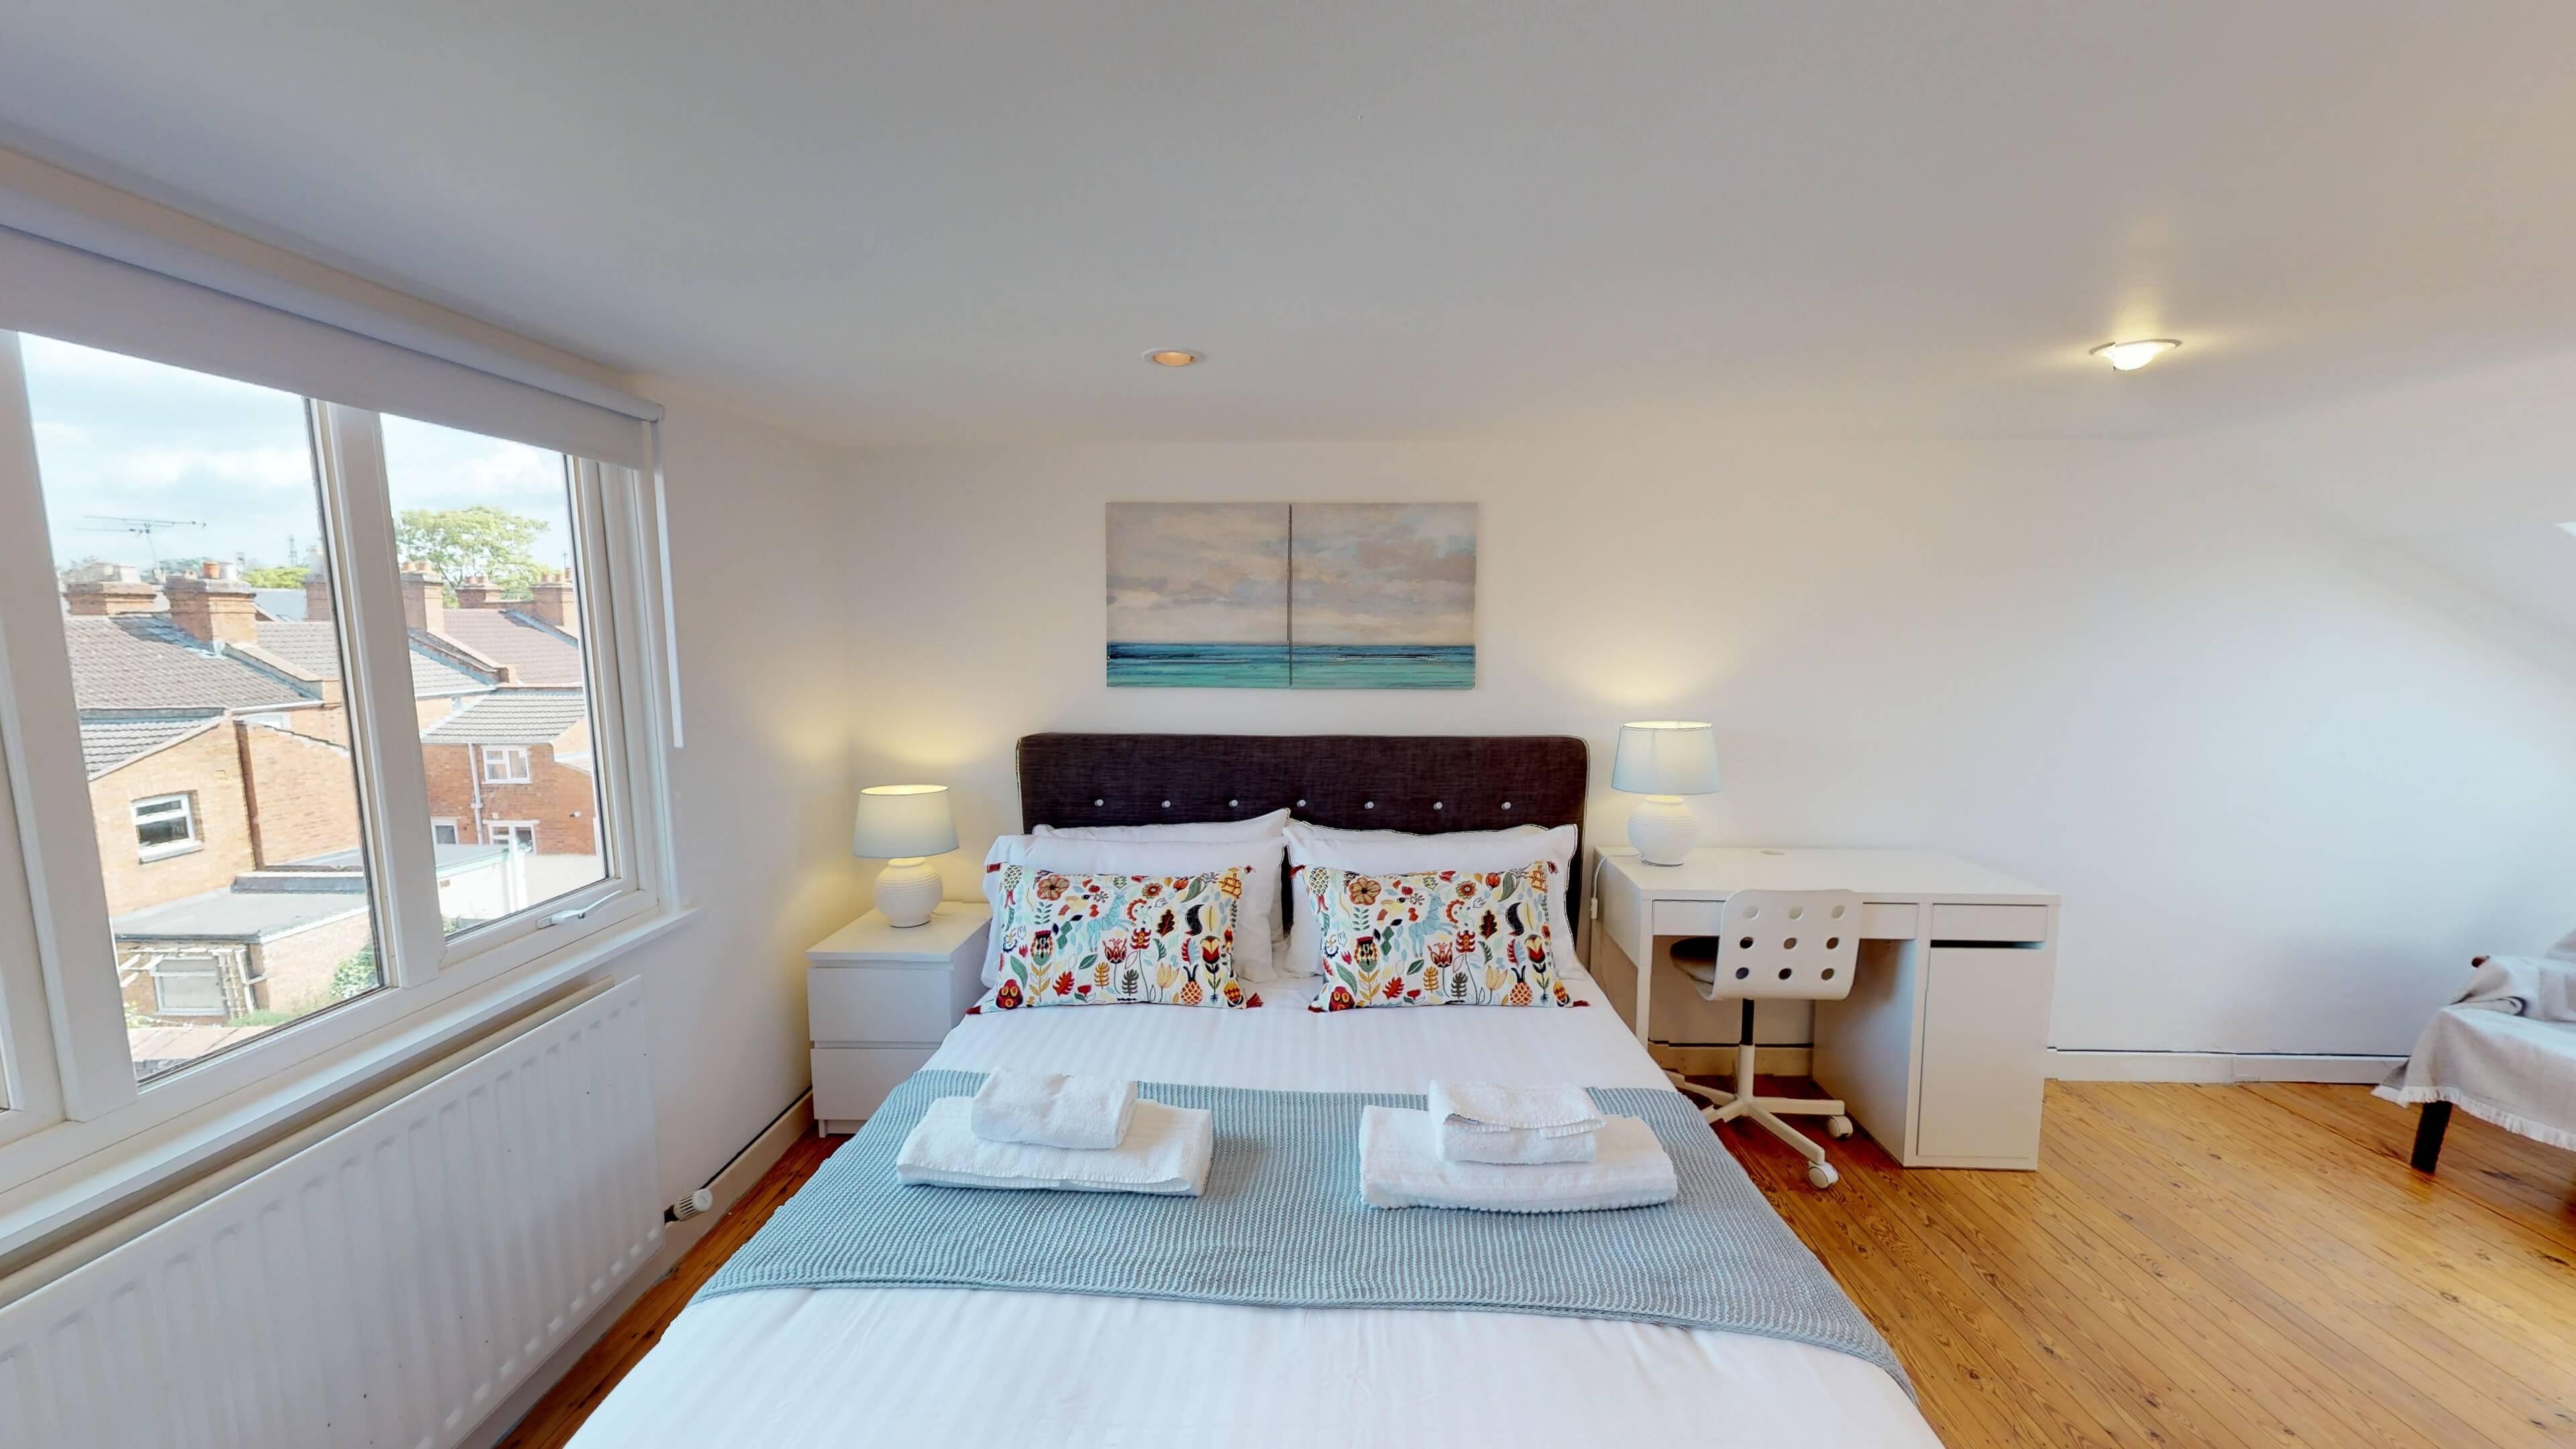 Gordon Street Bedroom22